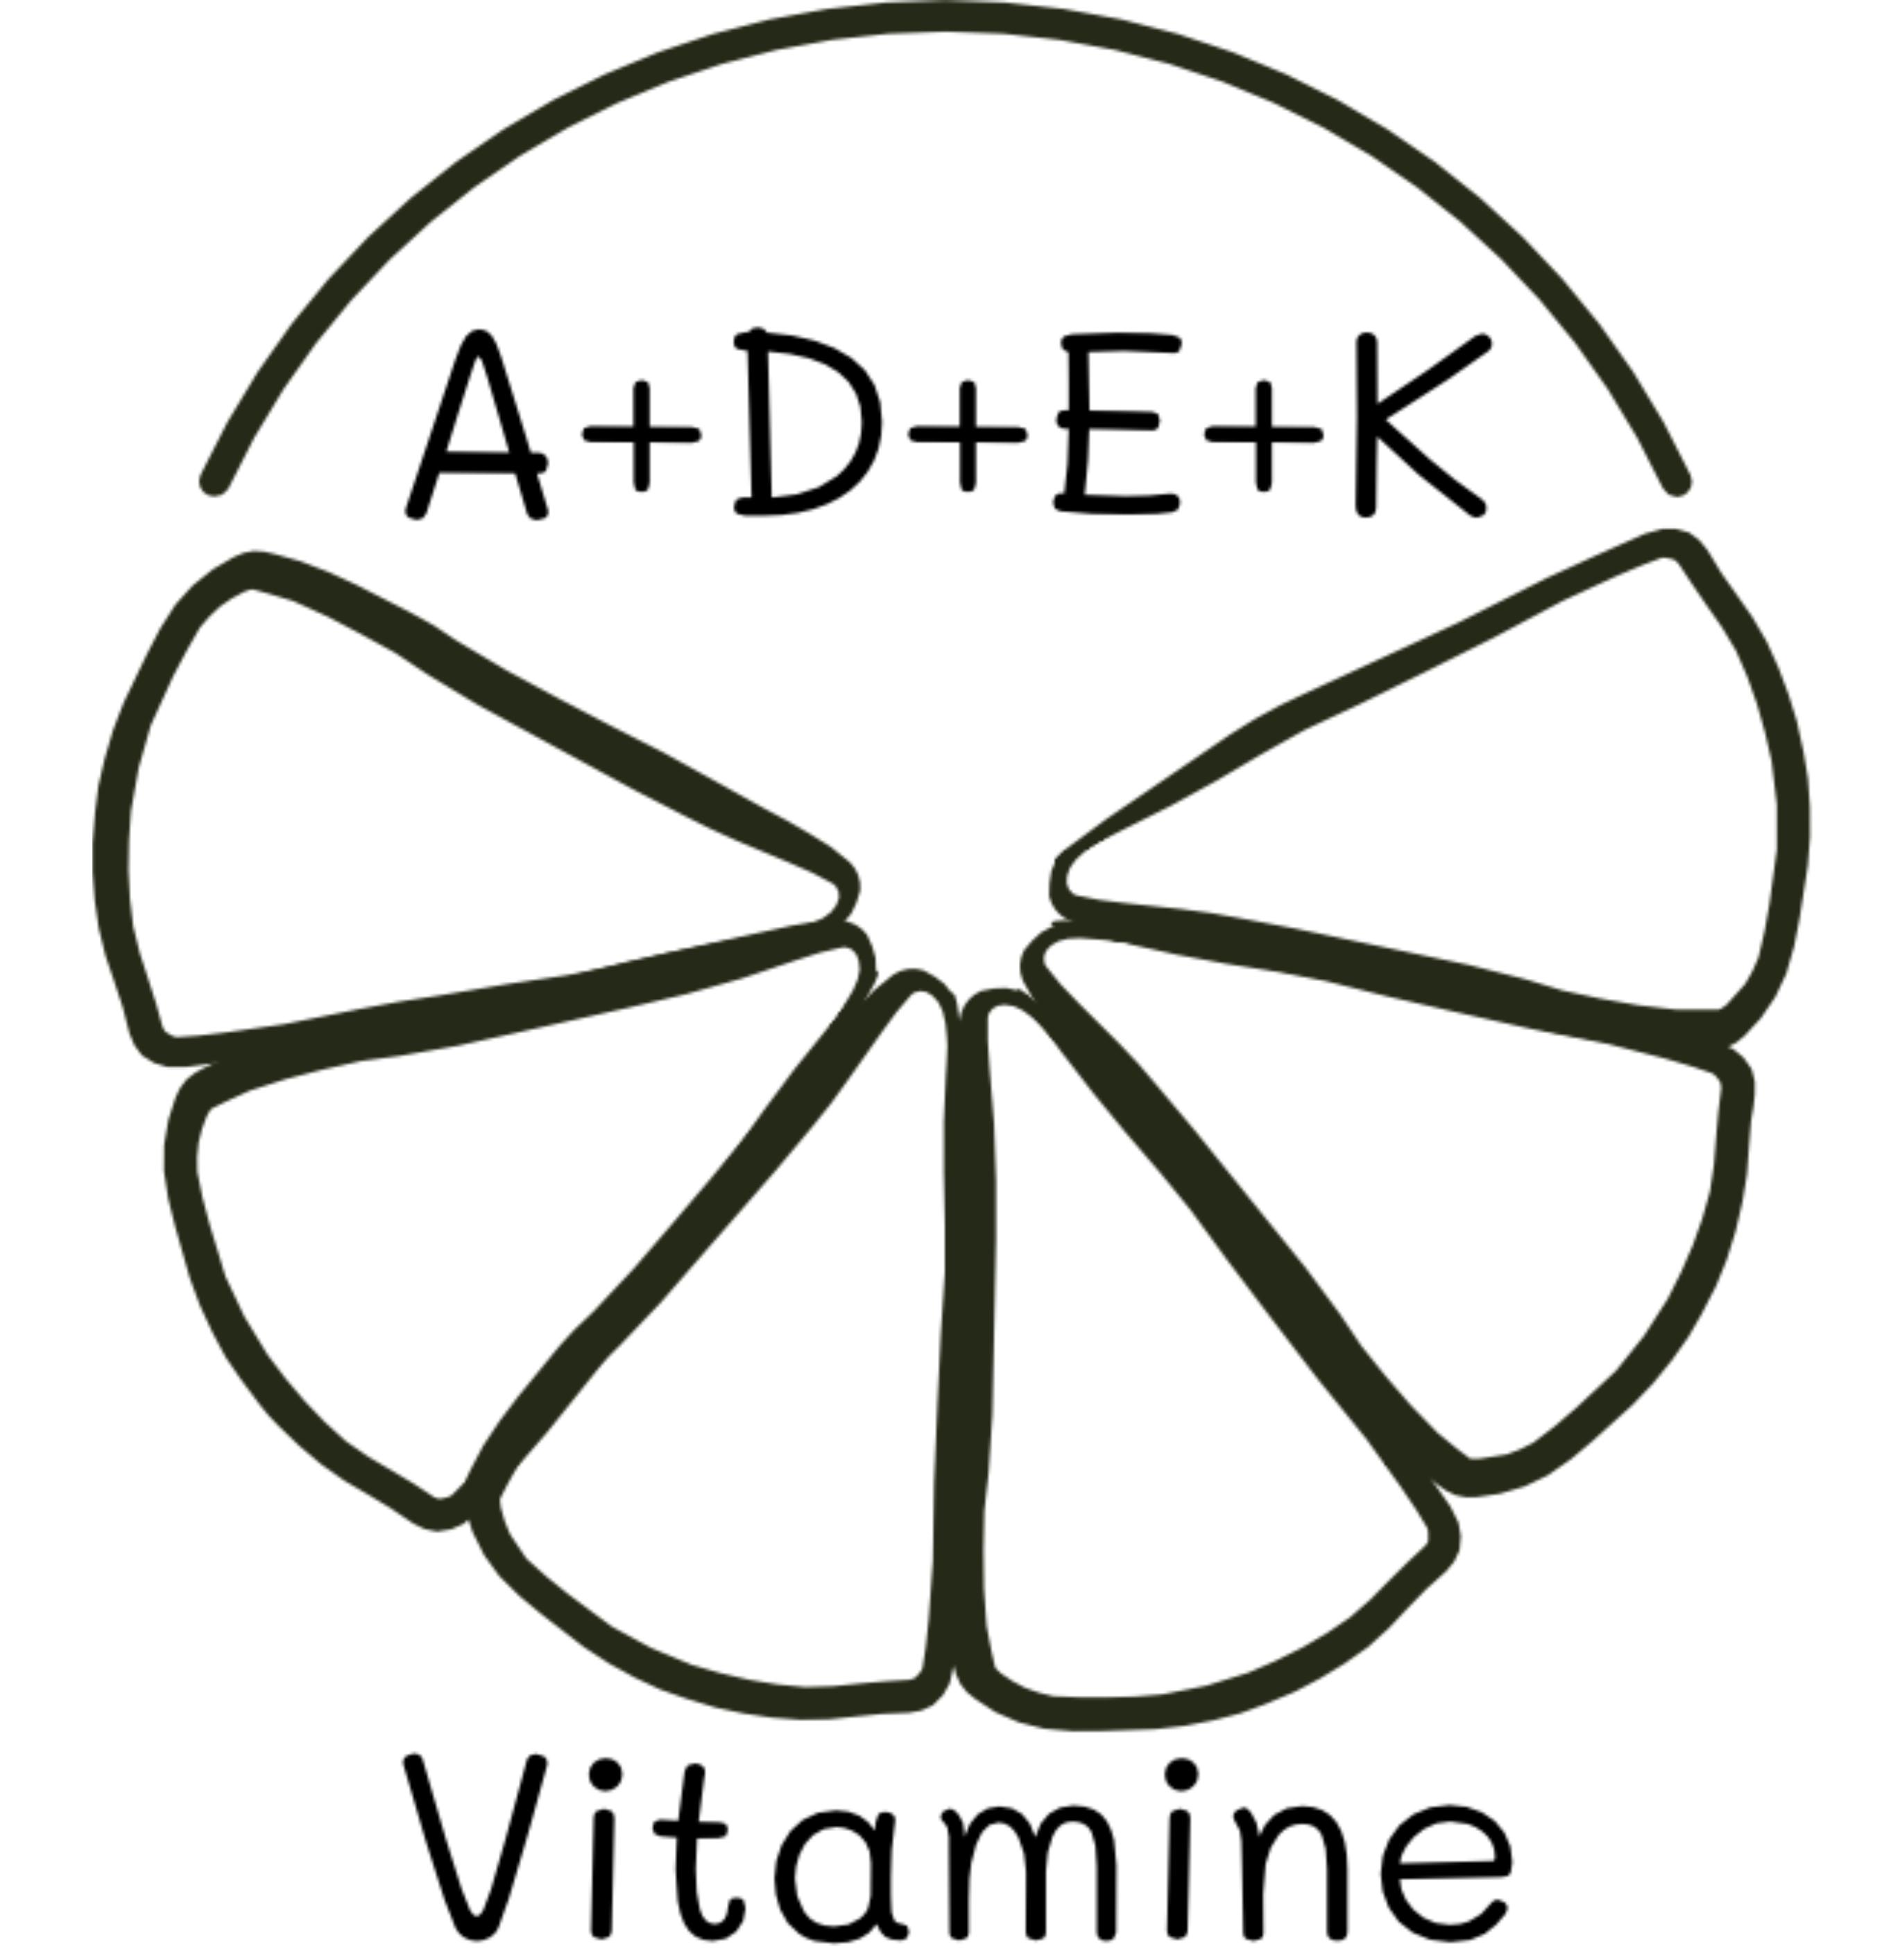 bewusstnatur Vitamine A+D+E+K